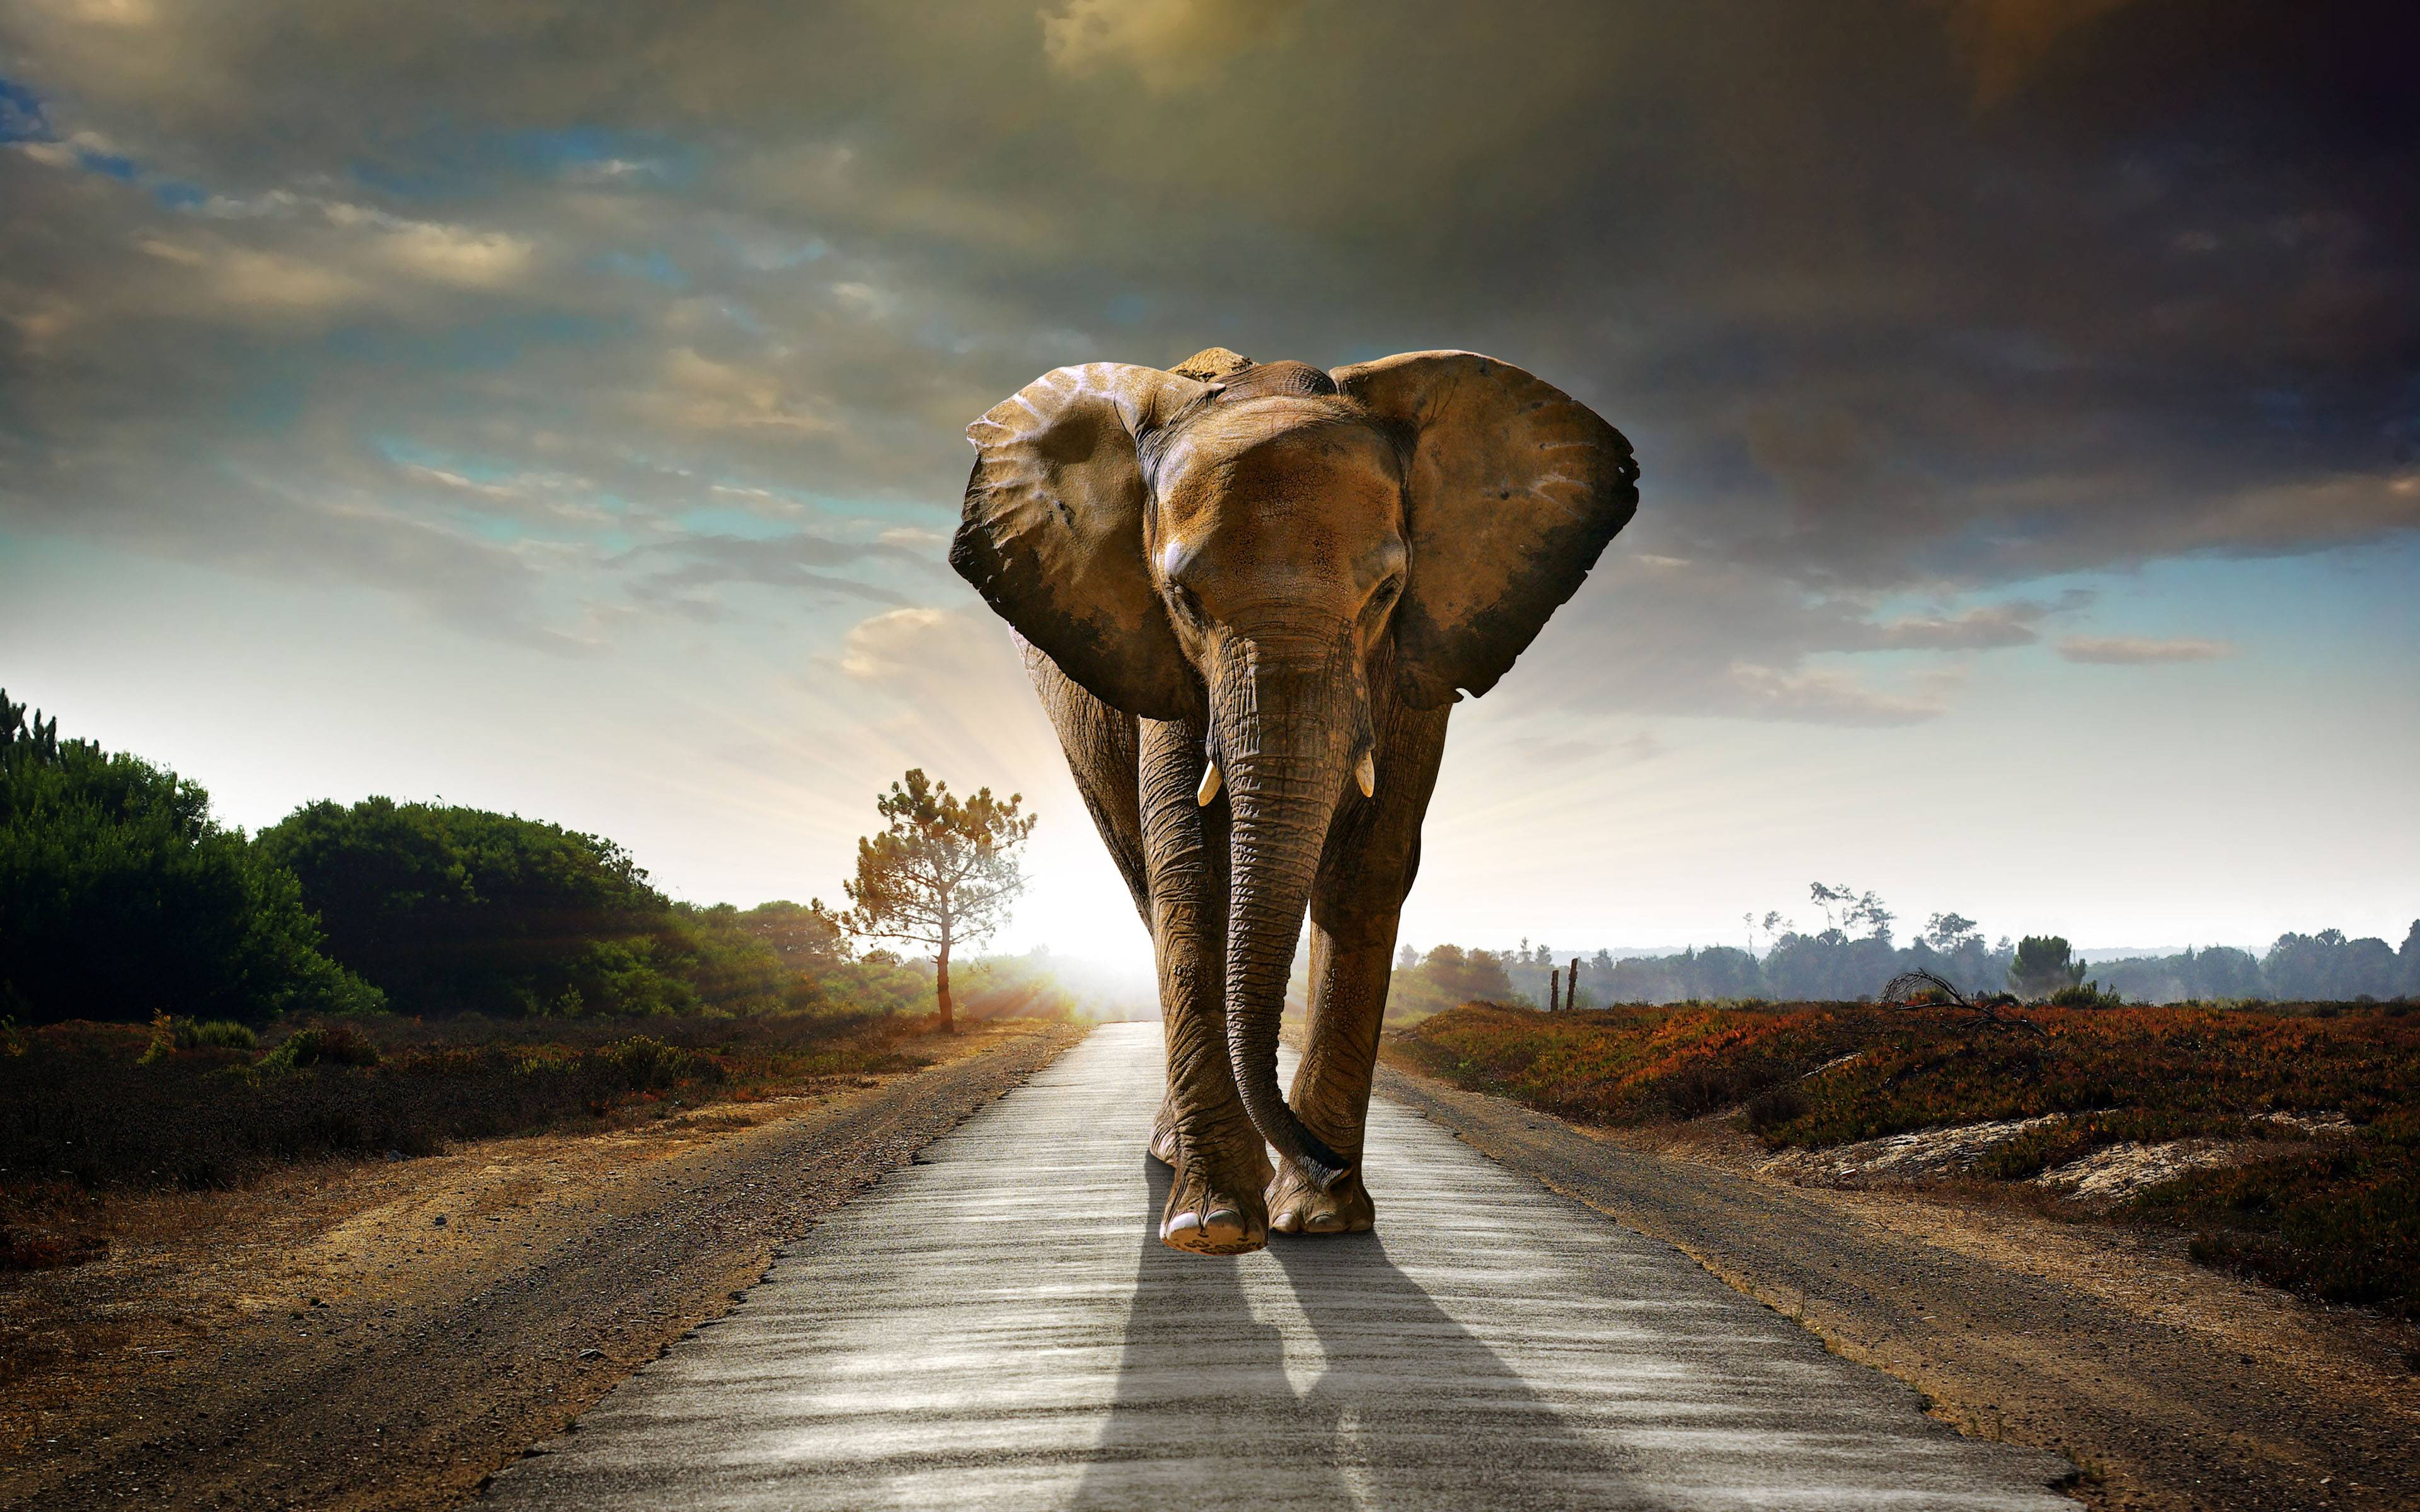 Wallpaper download elephant - African Elephant Wallpaper Free Download 10963 Wallpaper Cool